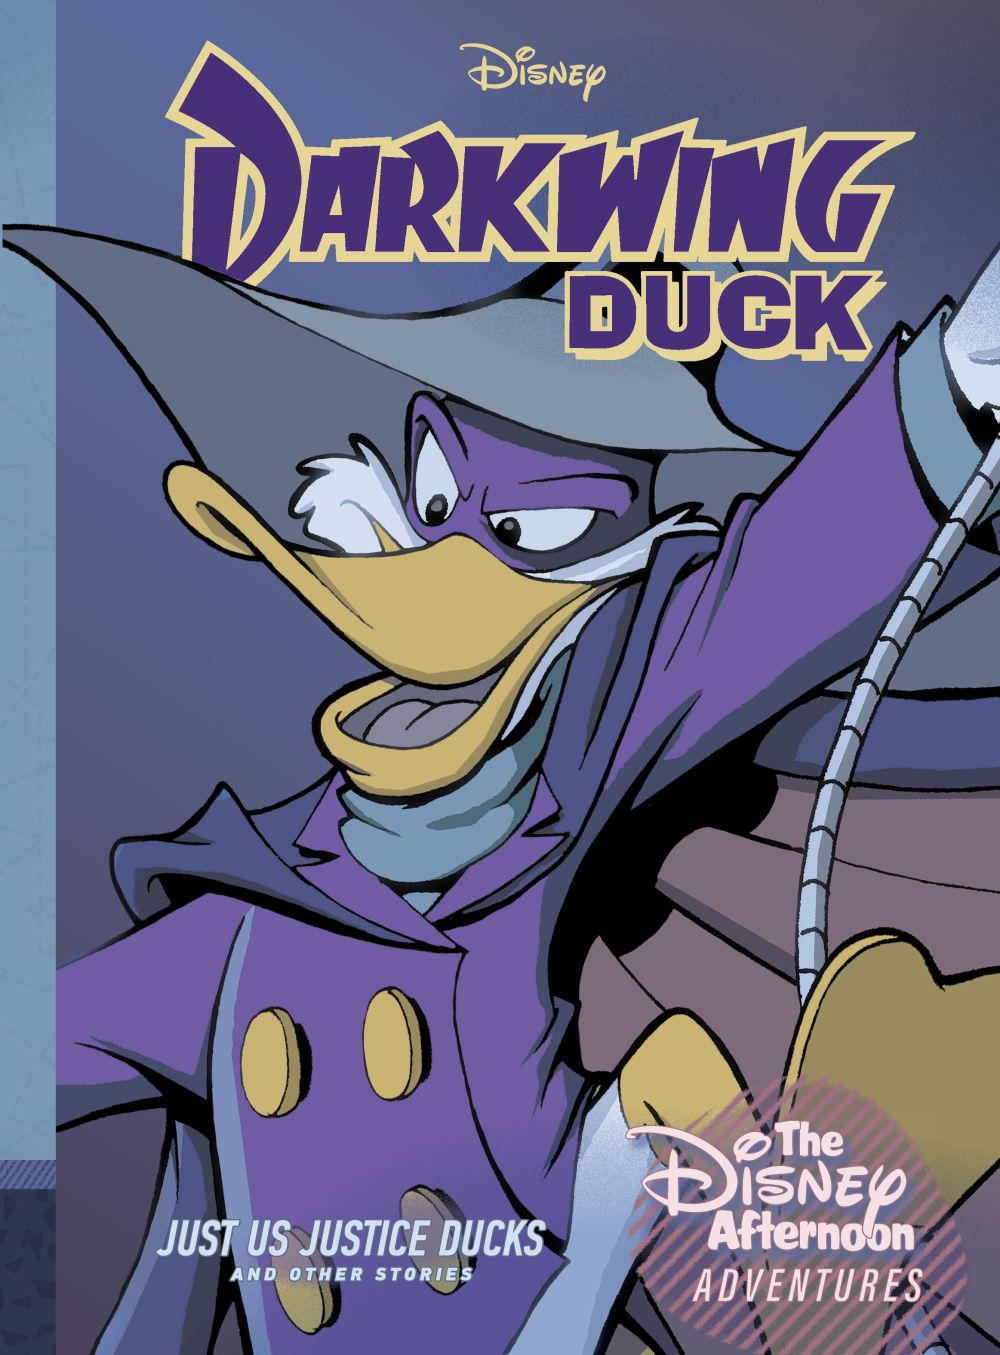 Darwink Duck: Just Us Justice Ducks